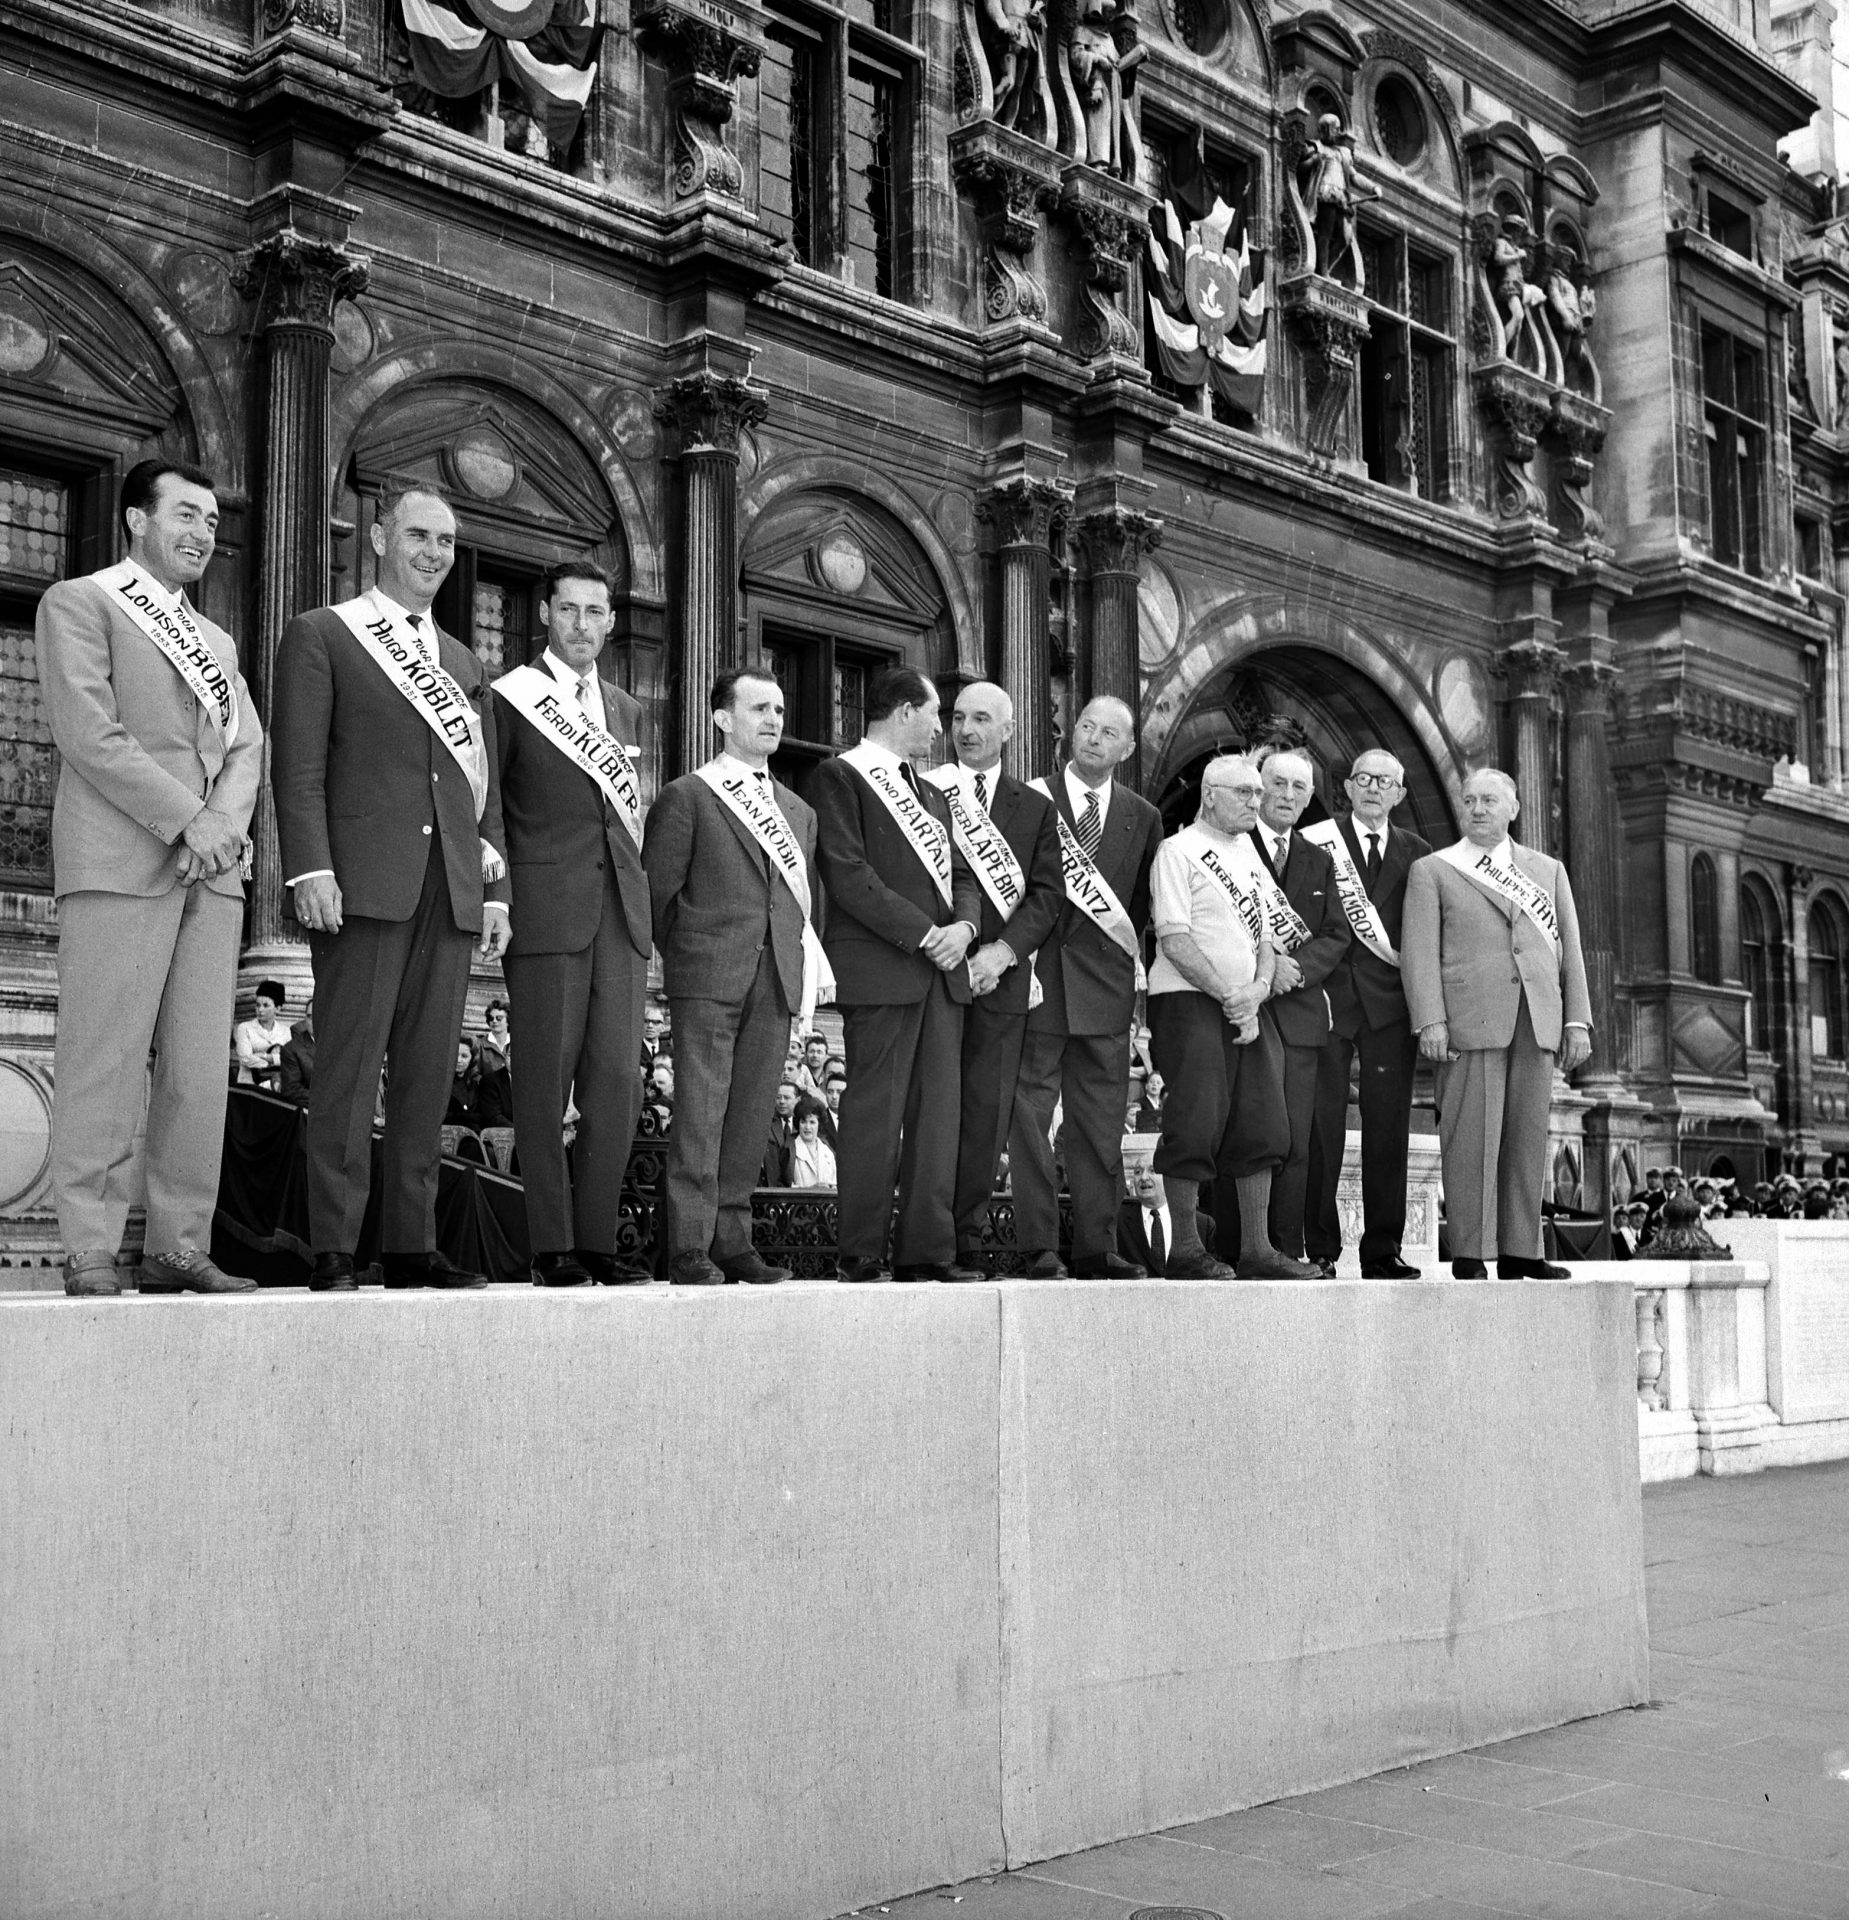 Historičtí šampioni. Zleva doprava: Louison Bobet (od roku 1953 do roku 1955), Hugo Koblet (Švýcarsko, 1951), Ferdinand Kubler (Švýcarsko, 1950),Jean Robic (1947), Gino Bartali (Ital, 1938), Roger Lapébie (1937), Nicolas Frantz (rodák z Lucemburku, 1927 a 1928), Eugène Christophe (3. cesta 1919), Lucien Buysse (Belgičan, 1926), Firmin Lambot (Belgičan, 1919) ), Philippe Thys (Belgičan, 1913, 1914 a 1920).